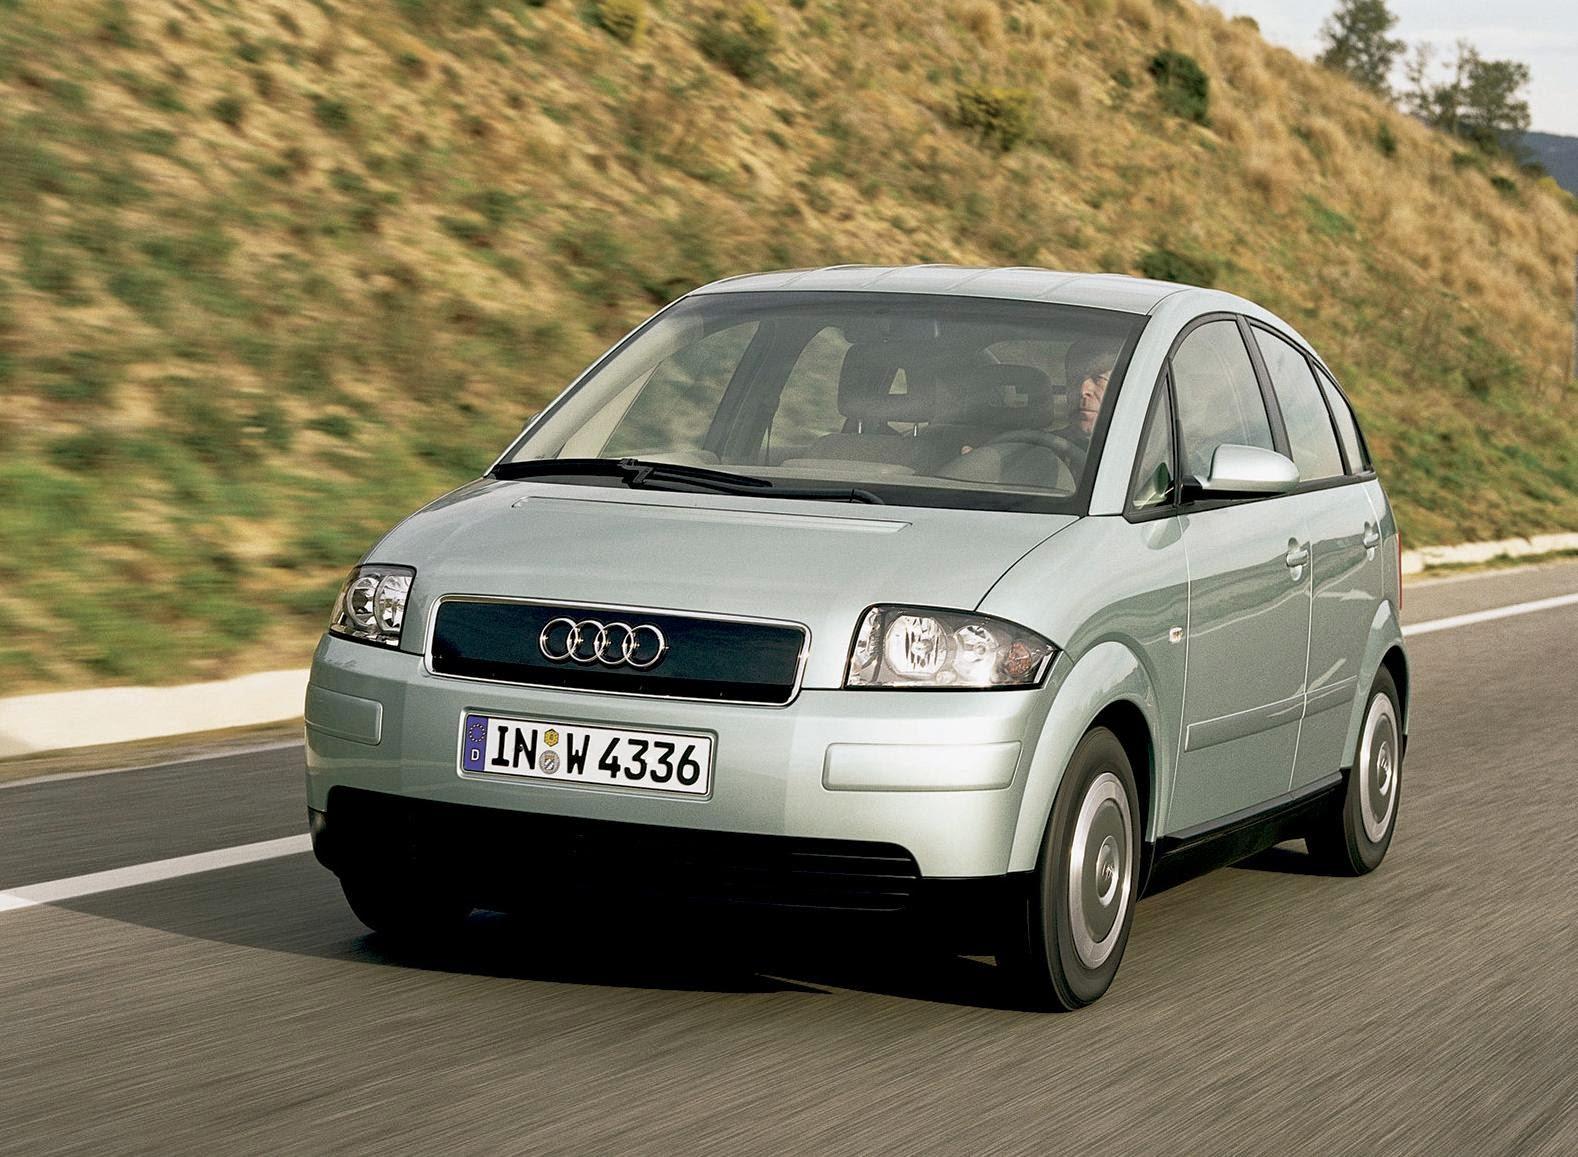 Audi A2 2001 Desktop Wallpaper